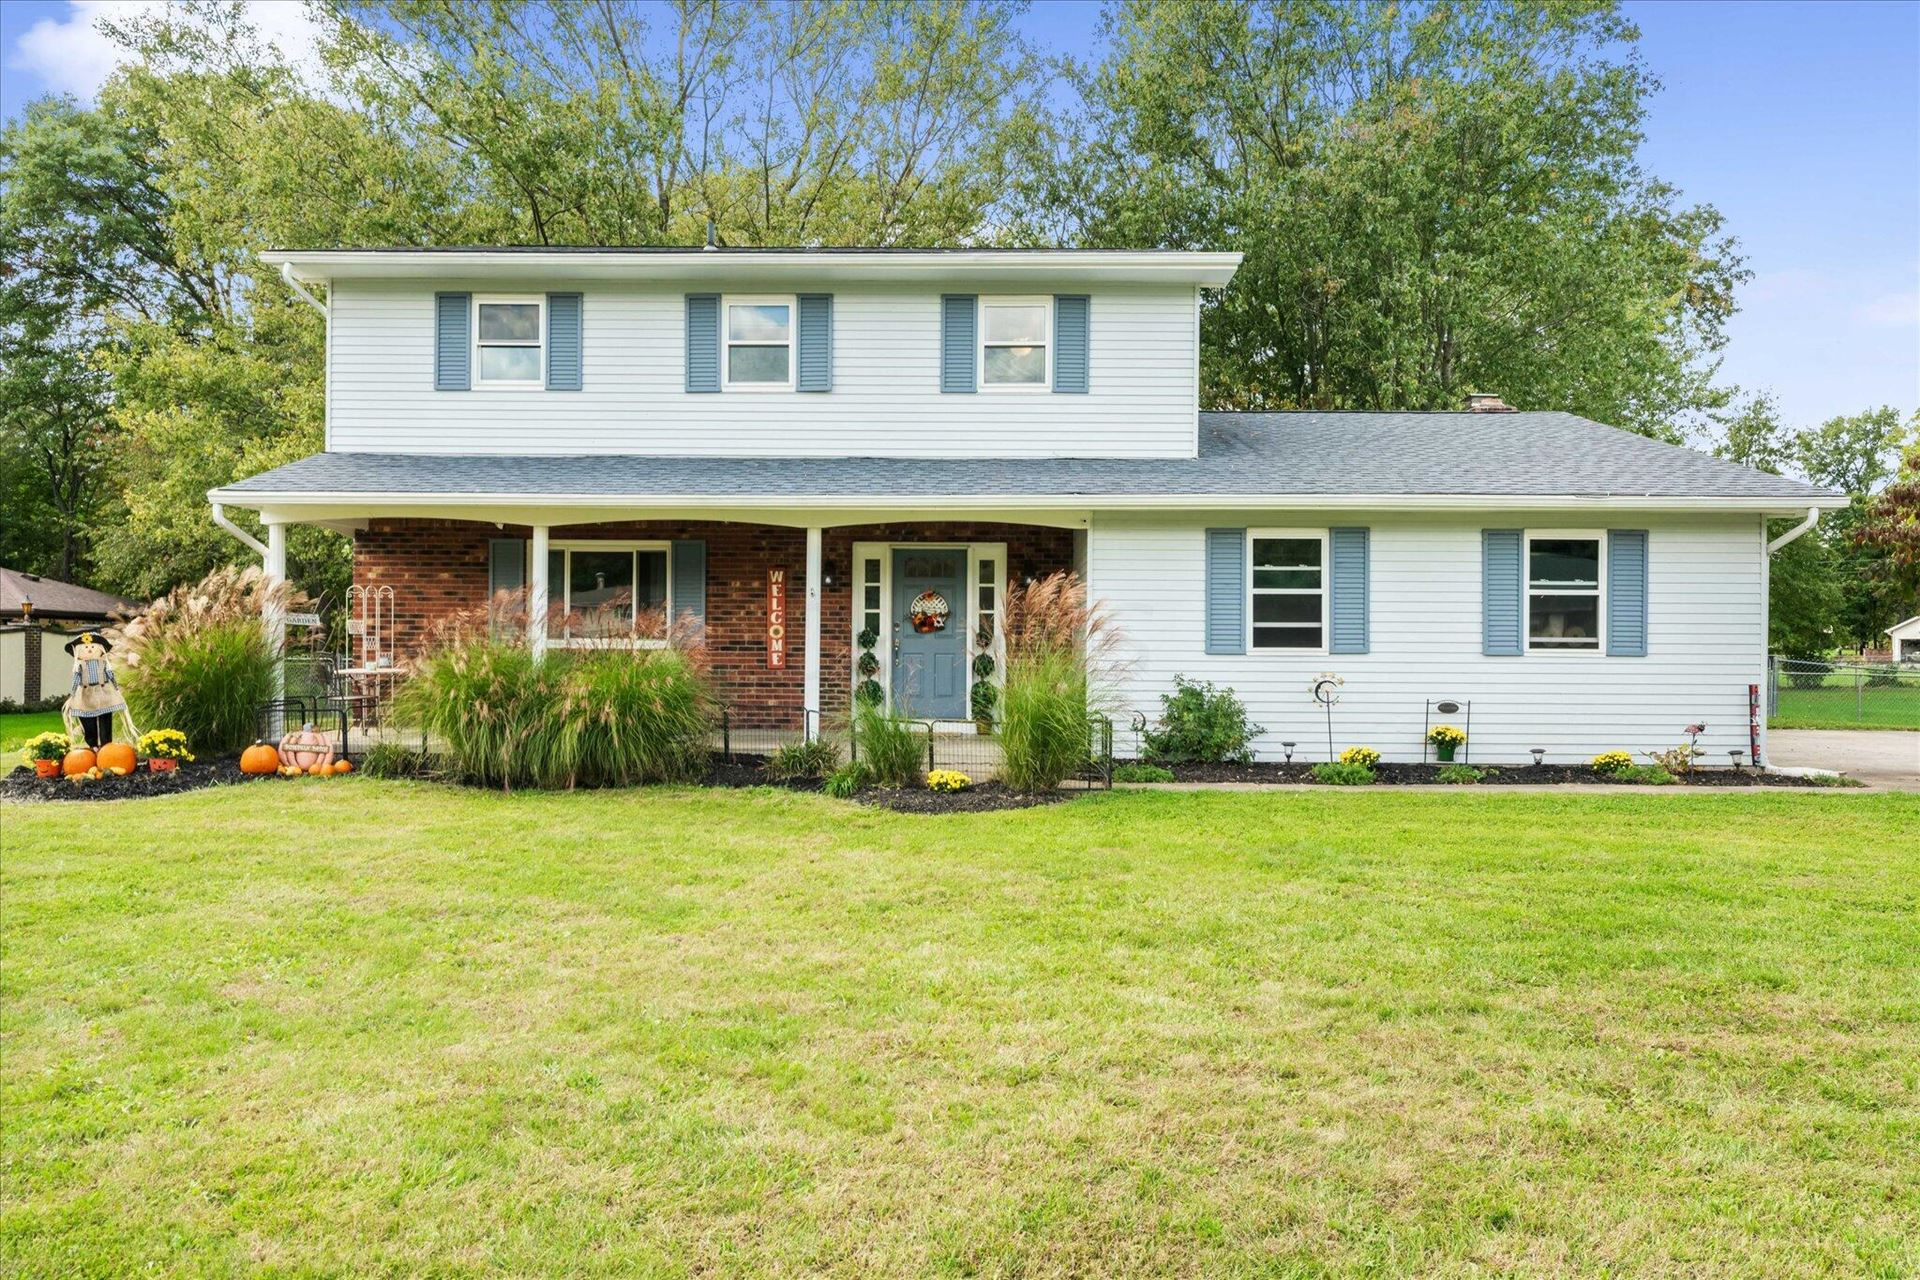 Photo of 13823 Nantucket Avenue, Pickerington, OH 43147 (MLS # 221040981)